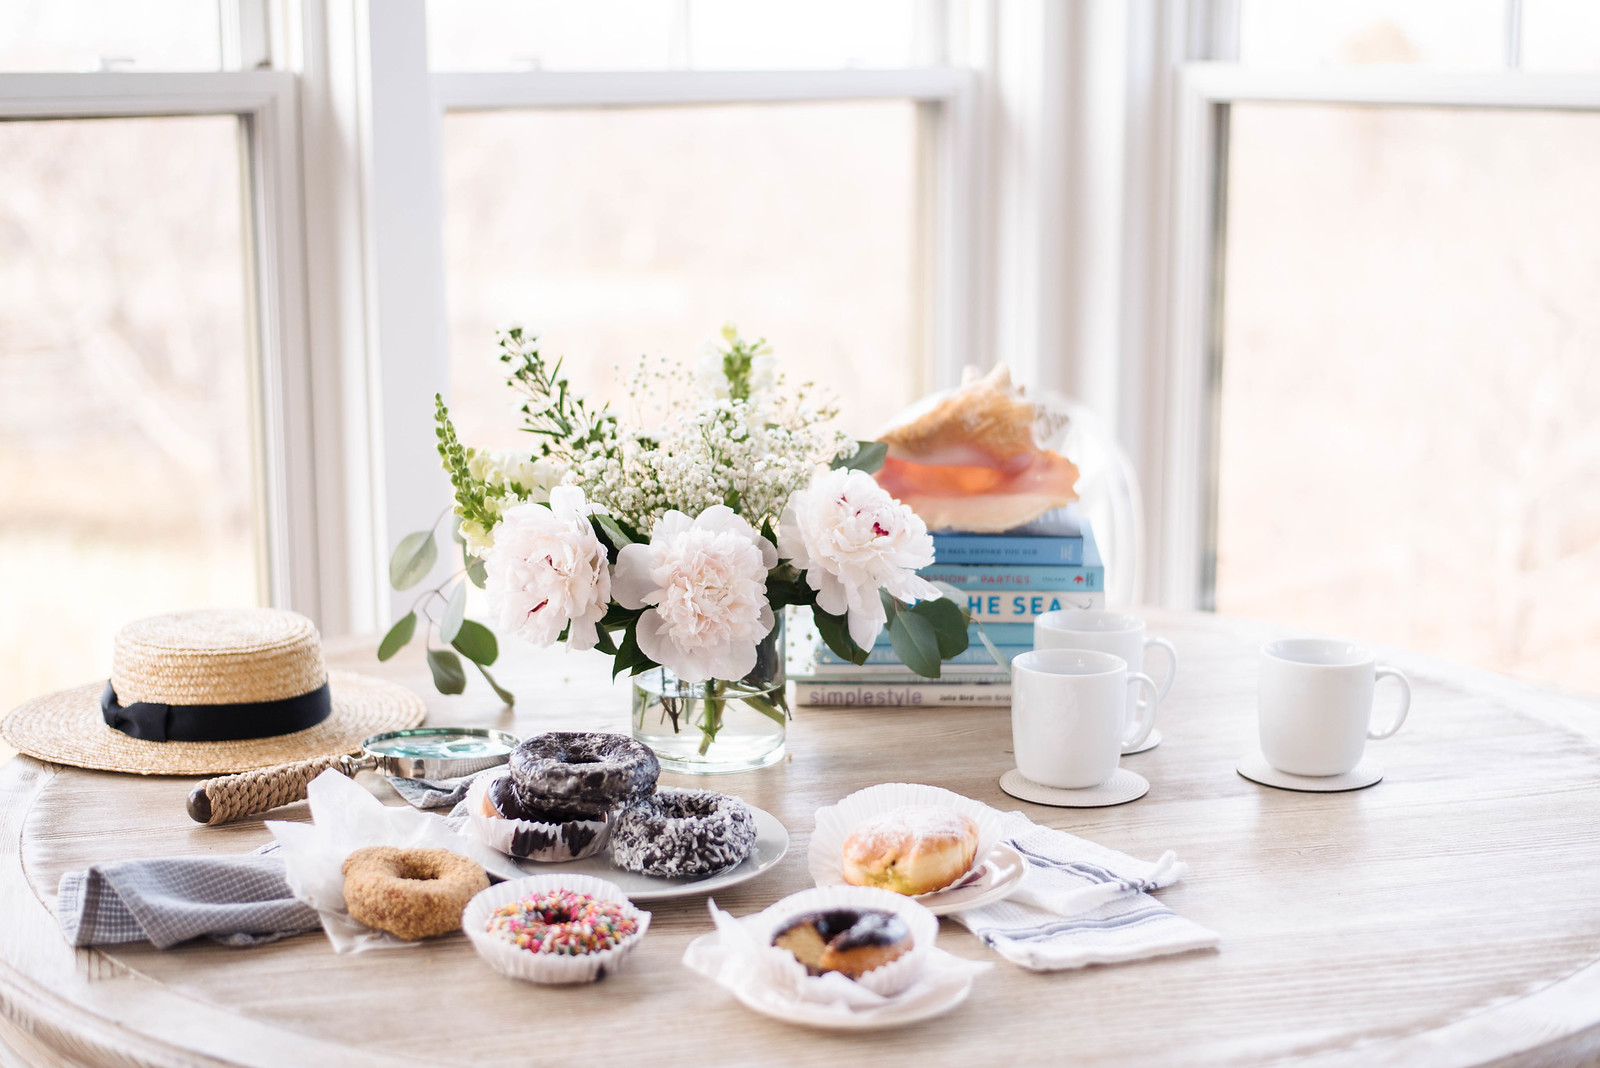 Hosting brunch with donuts on Marthas Vineyard on http://juliettelaura.blogspot.com/